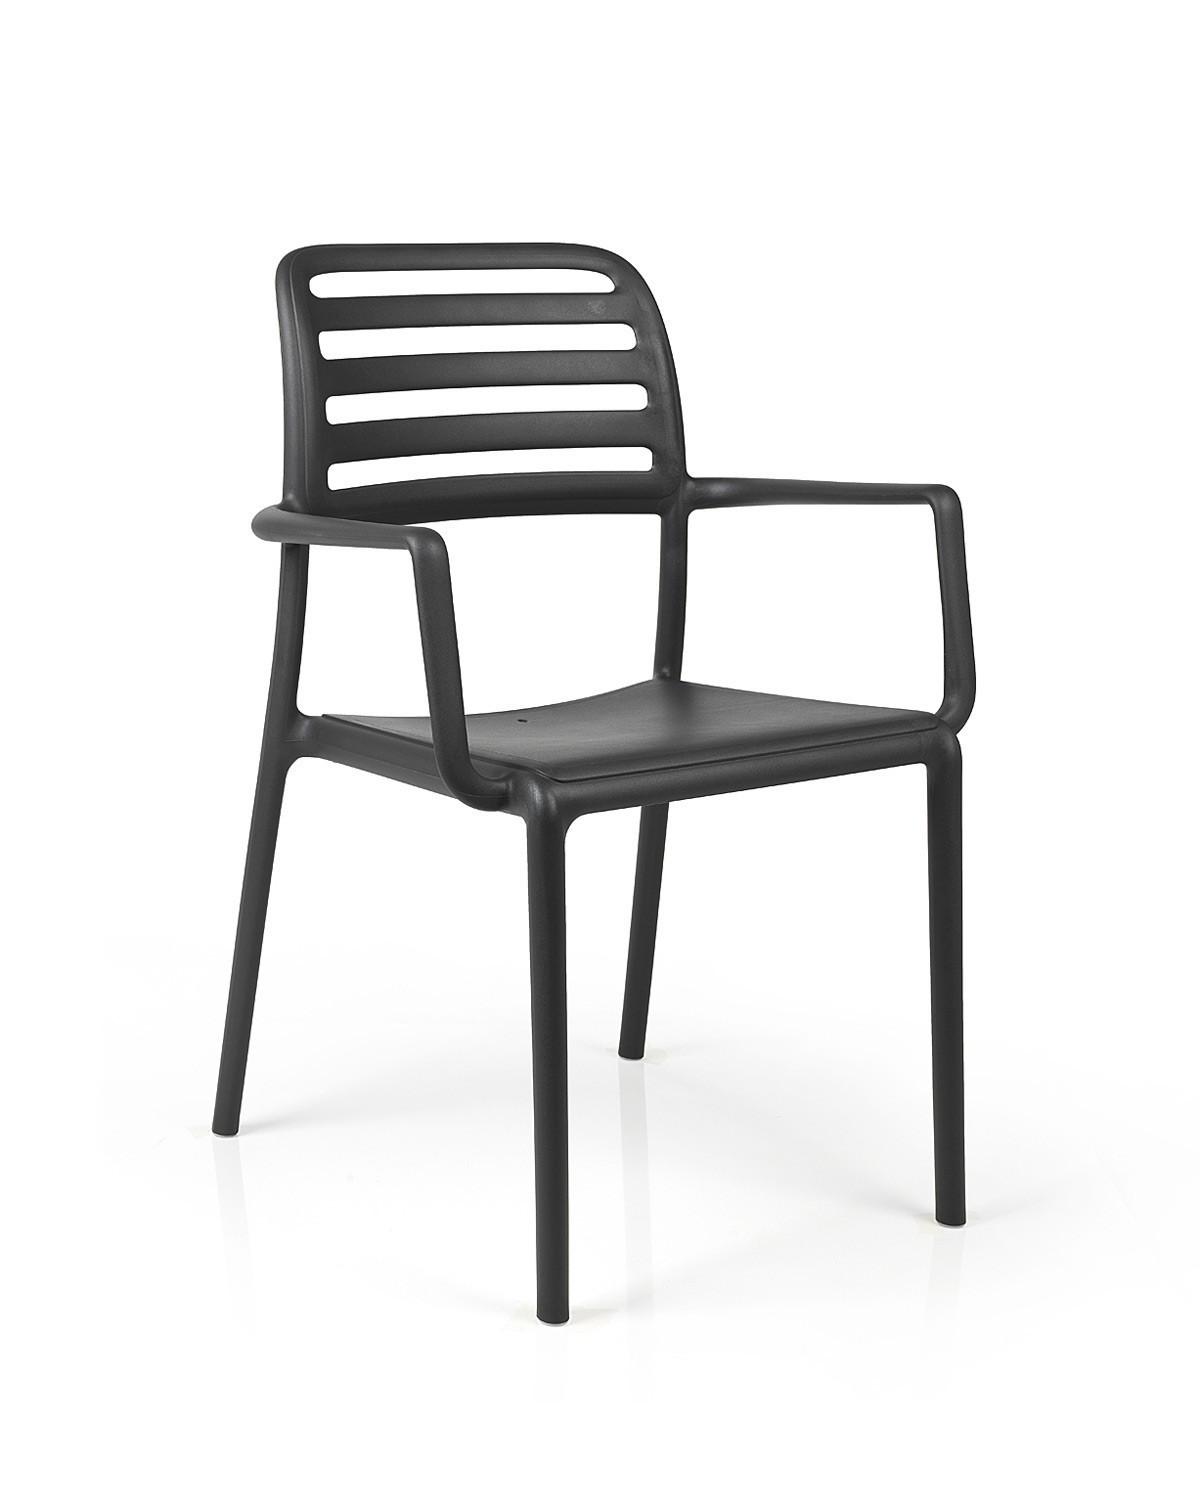 stapelstuhl gartenstuhl costa kunststoff stapelbar. Black Bedroom Furniture Sets. Home Design Ideas